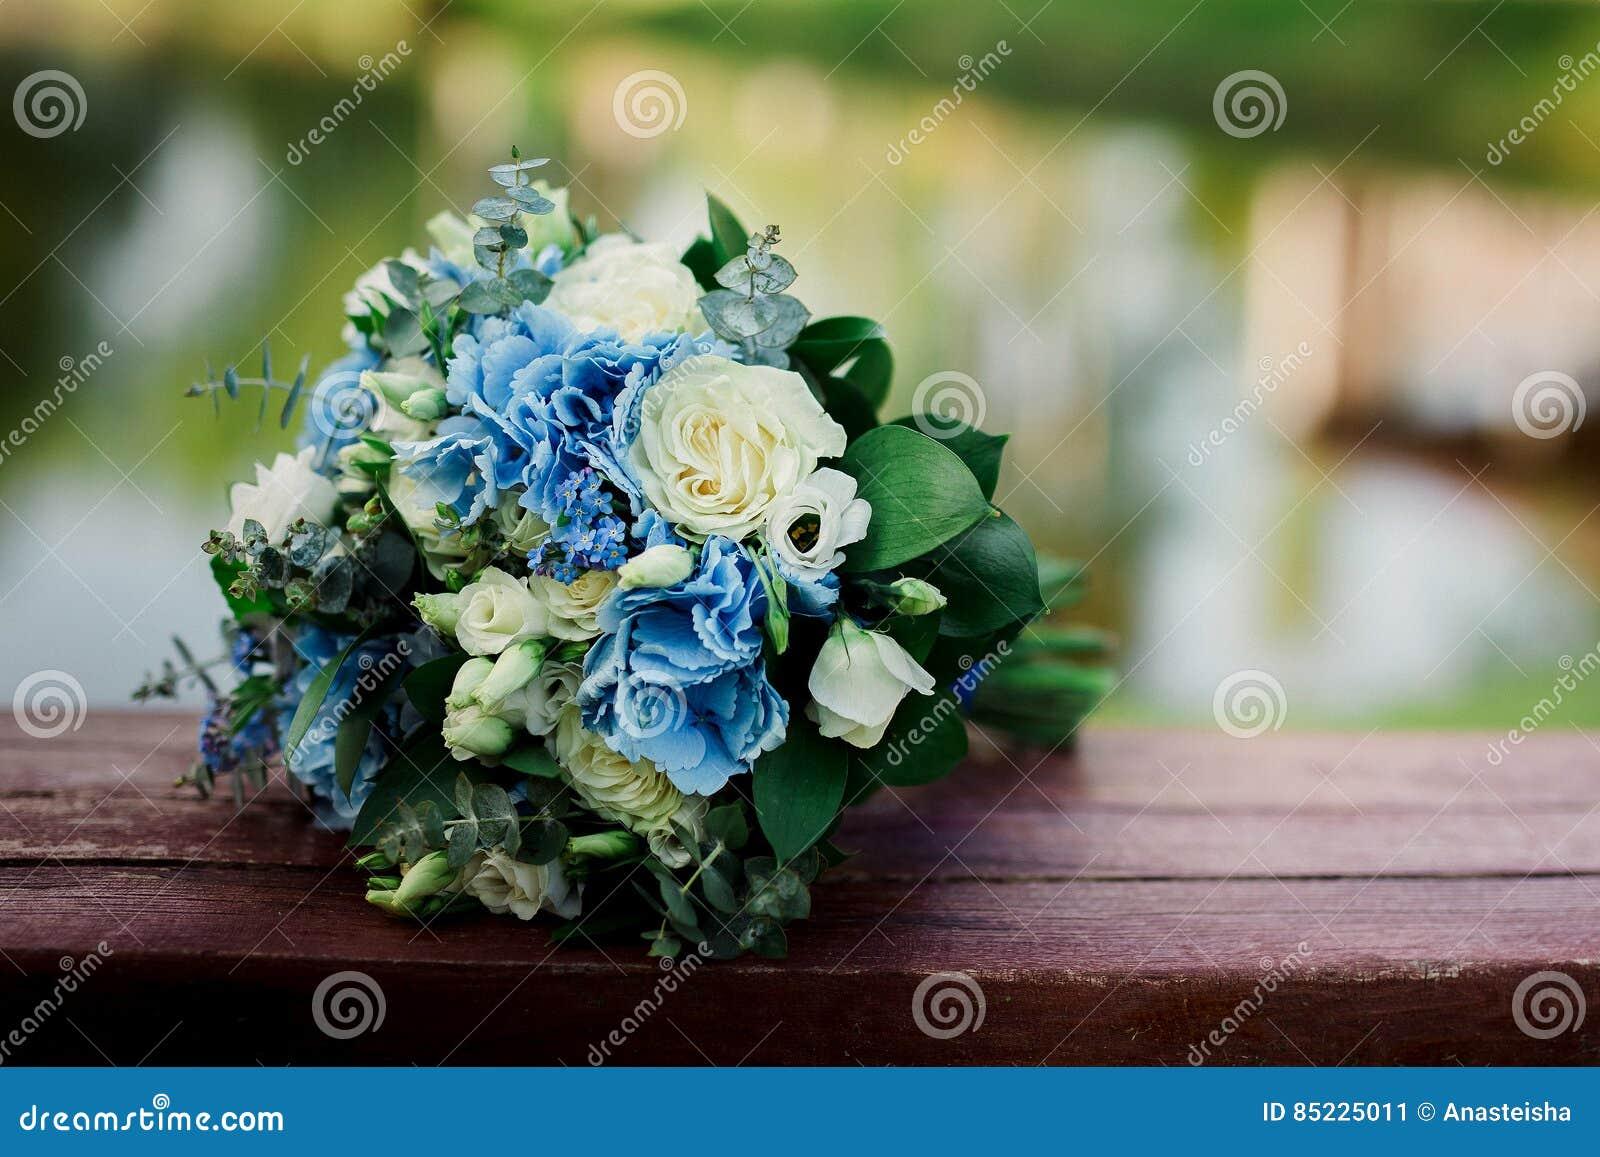 Blue And White Fresh Flowers Wedding Bouquet Stock Image Image Of